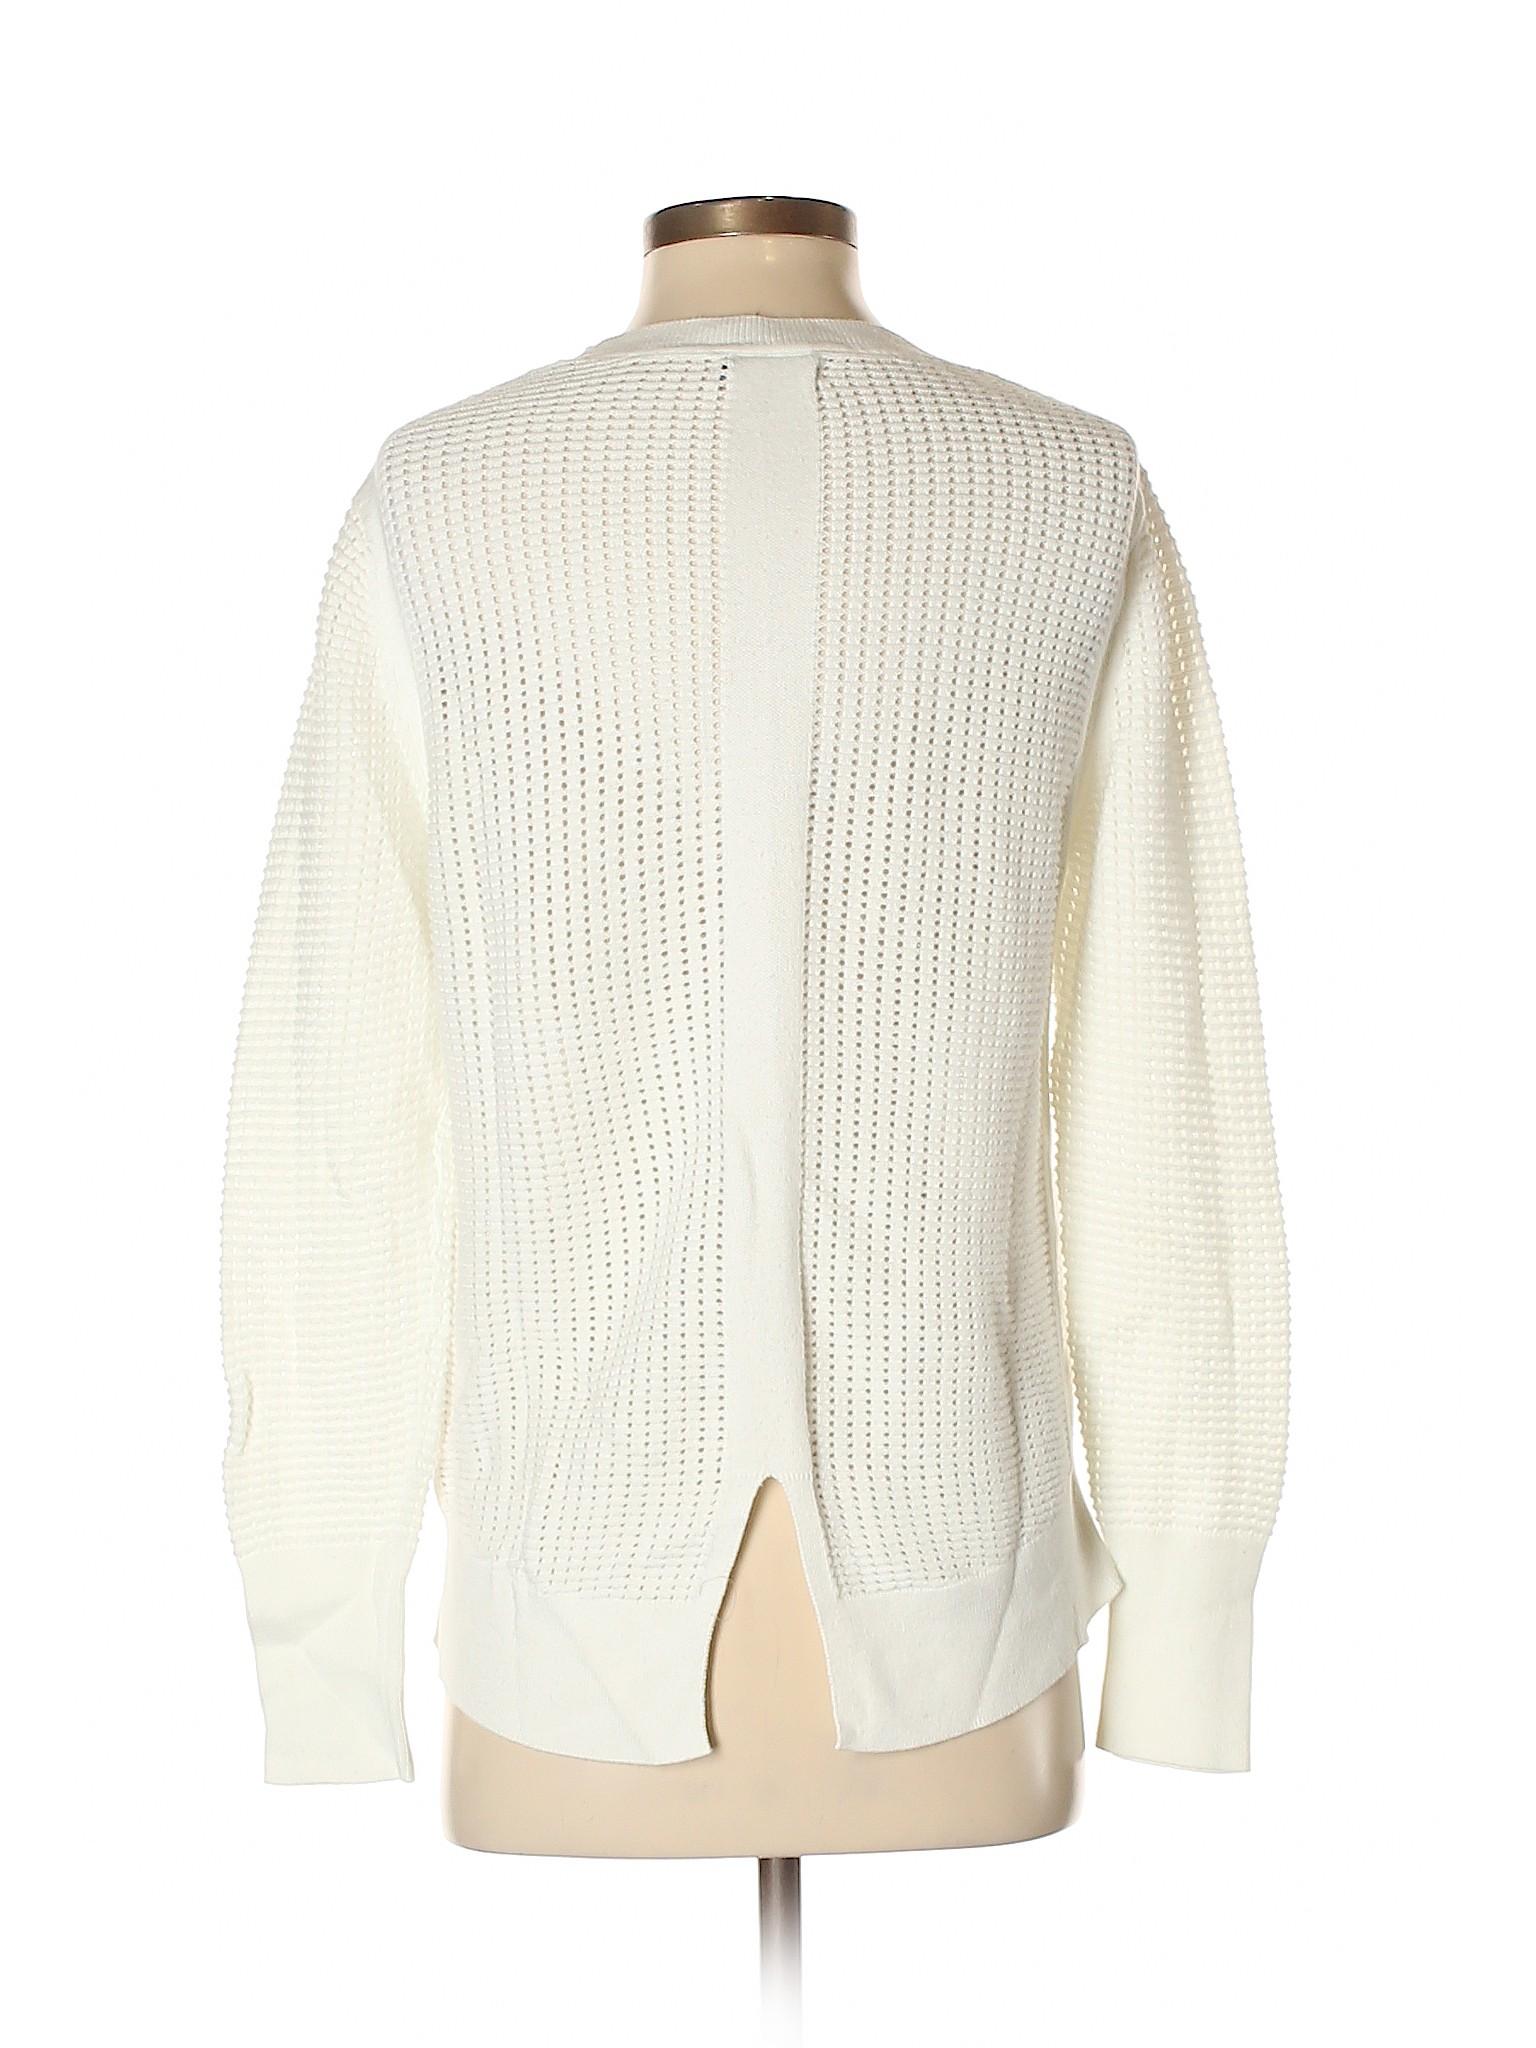 Republic Banana Sweater Pullover Boutique Banana Boutique 8qt0p